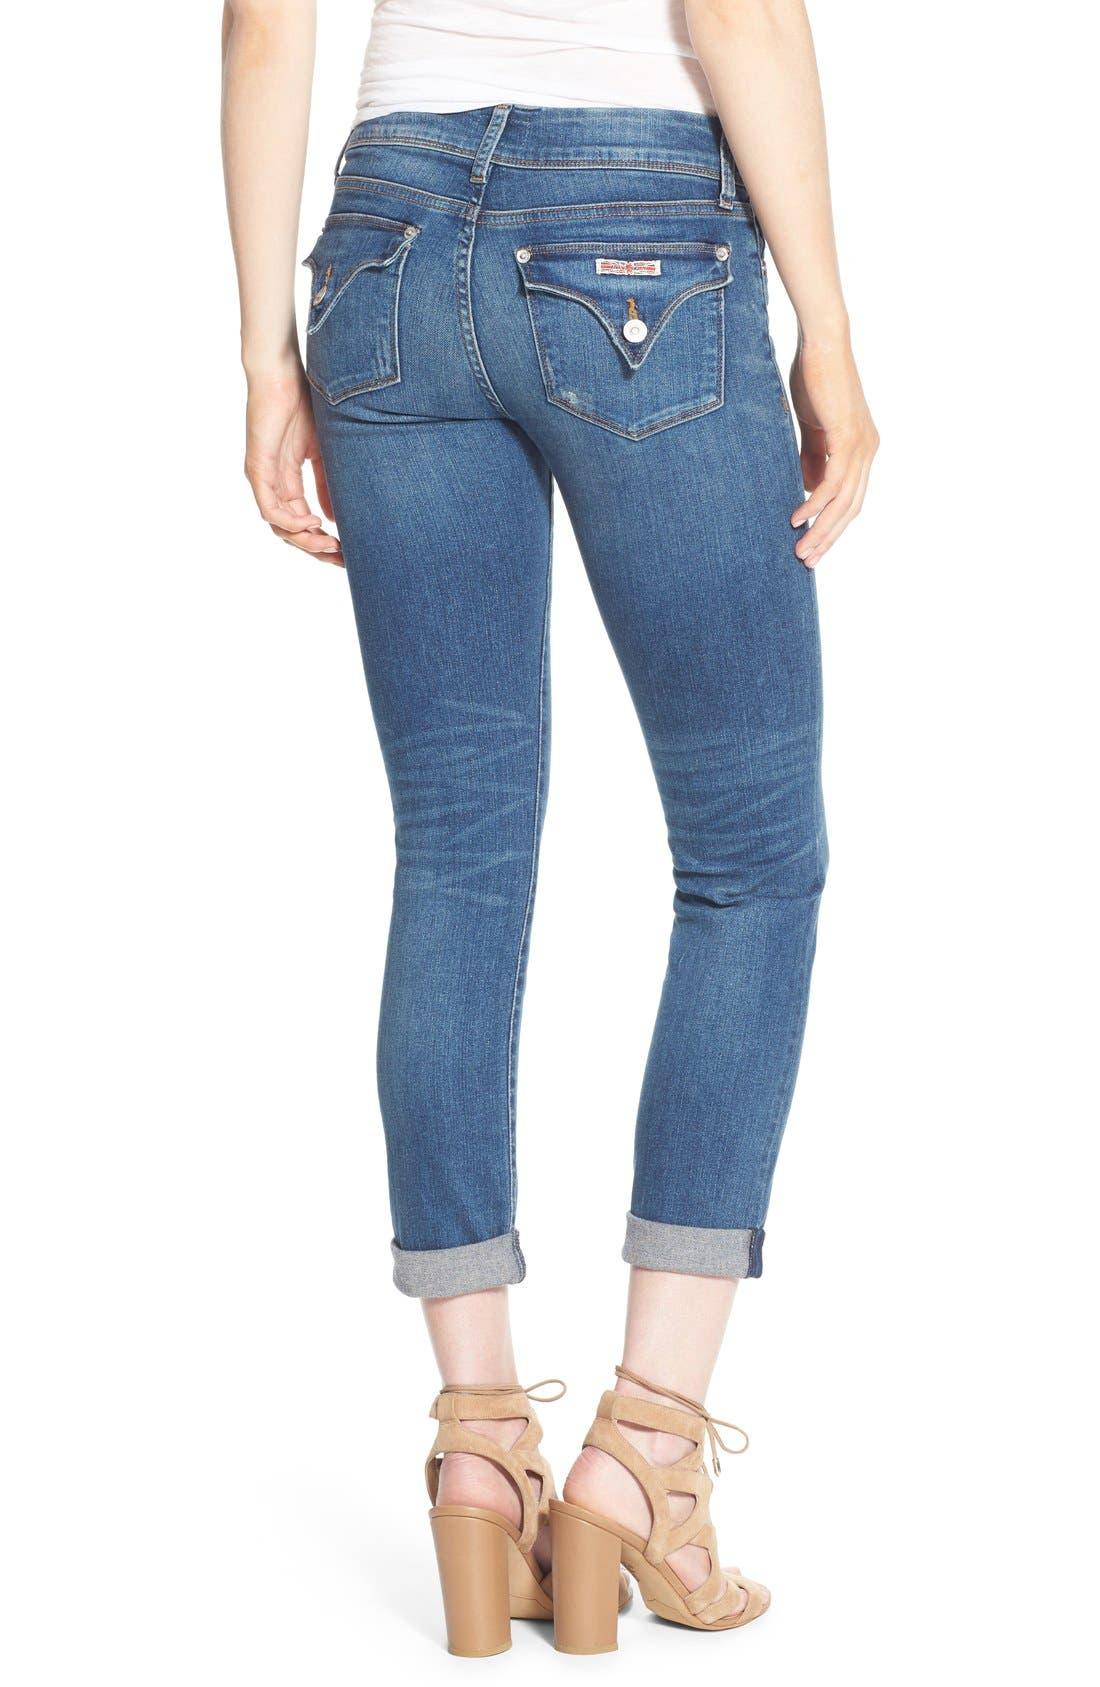 Alternate Image 2  - Hudson Jeans 'Ginny' Rolled Crop Jeans (Point Break)